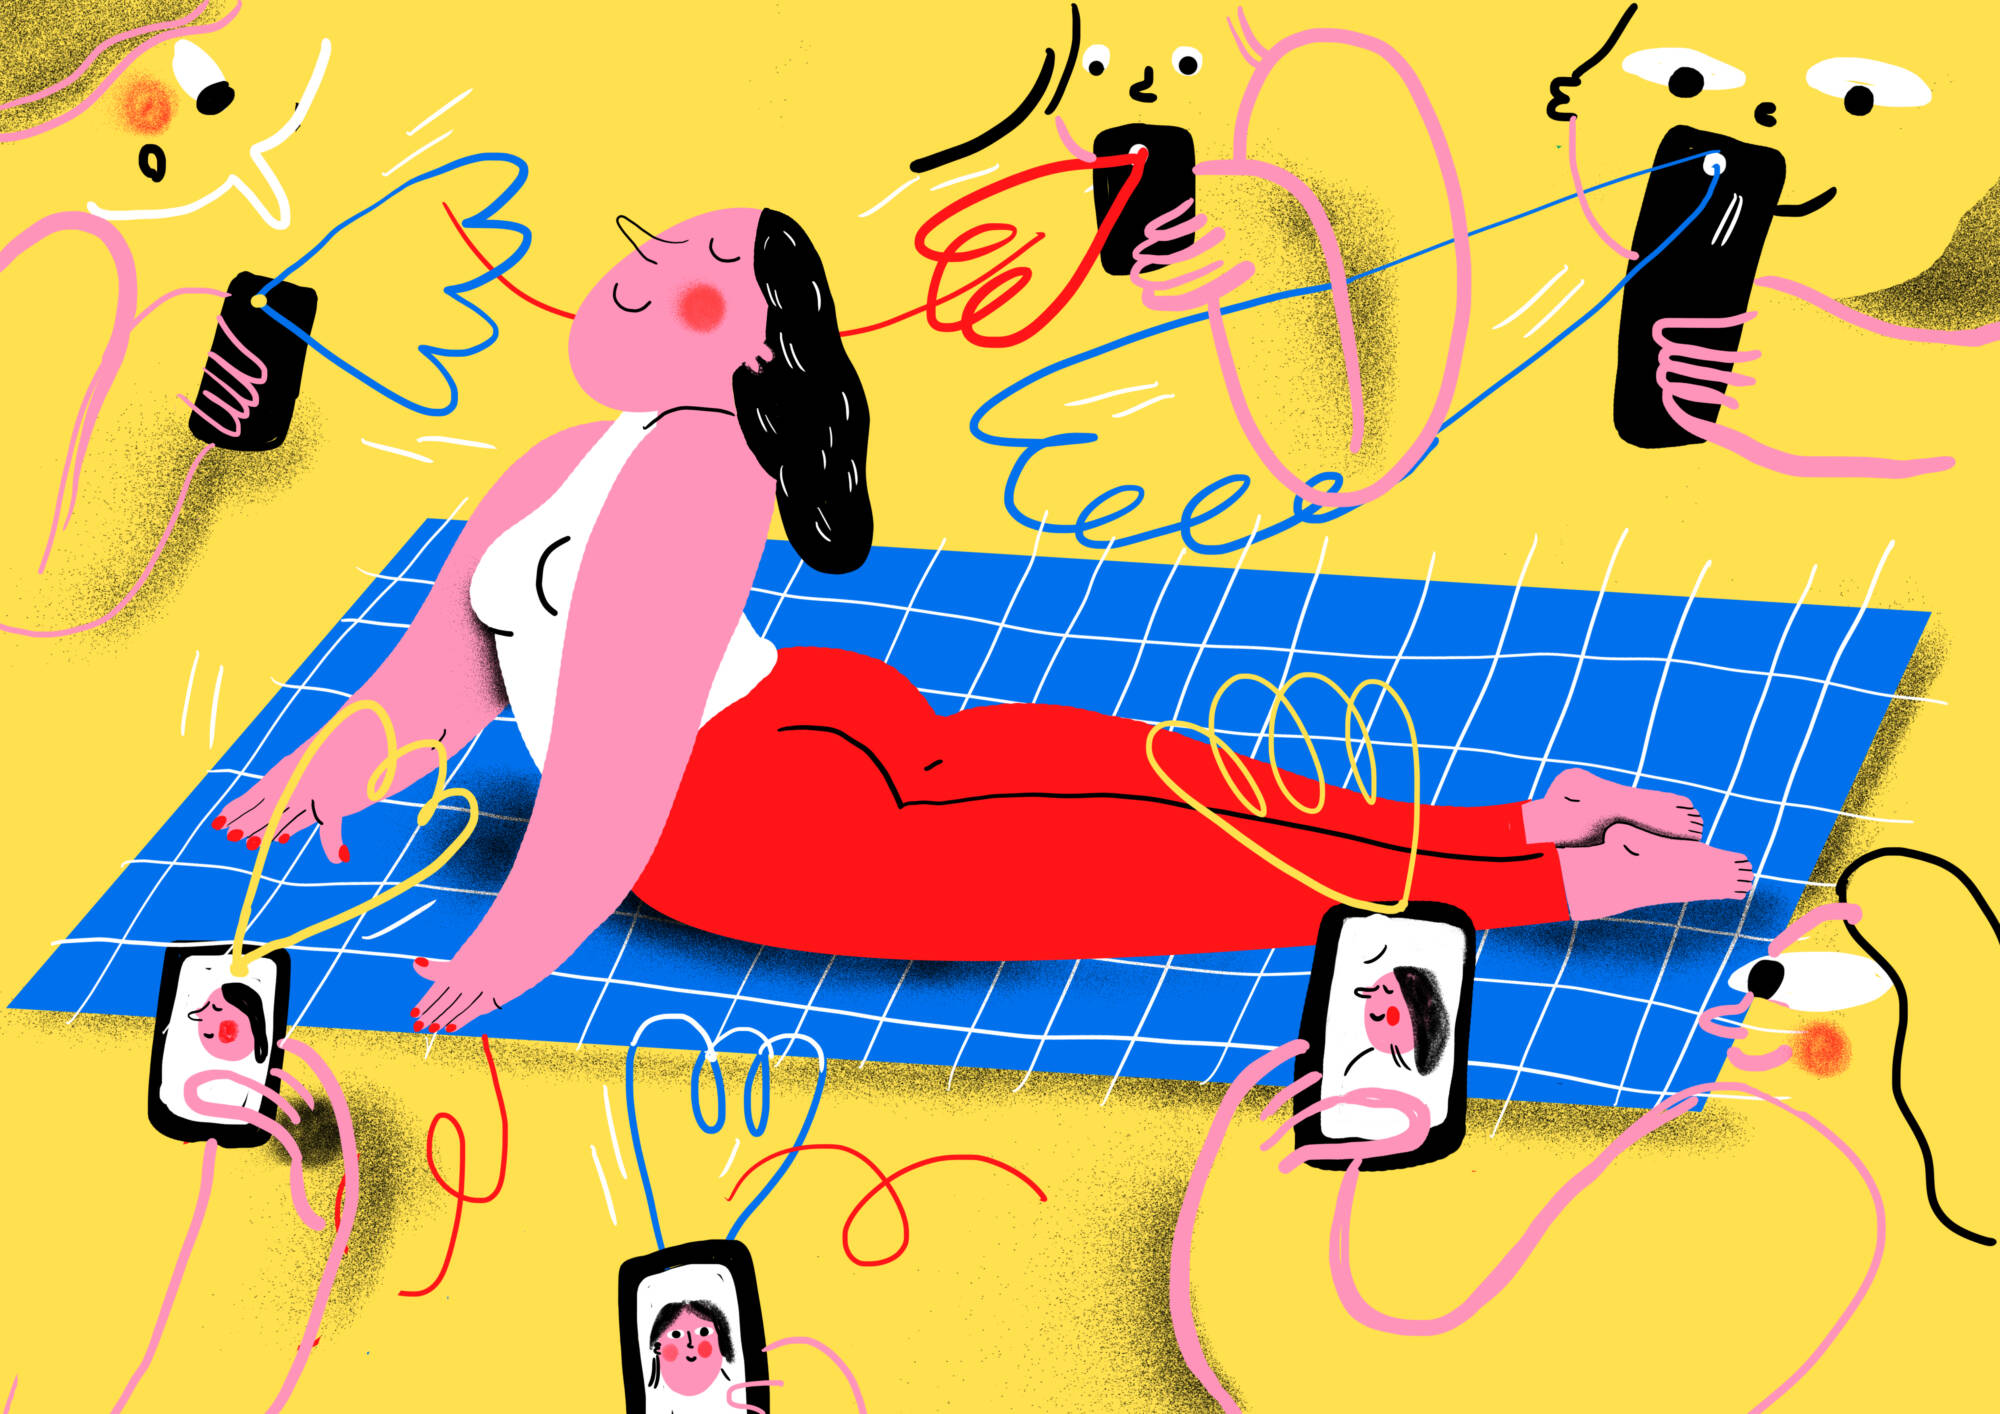 Has Yoga Lost its Focus?